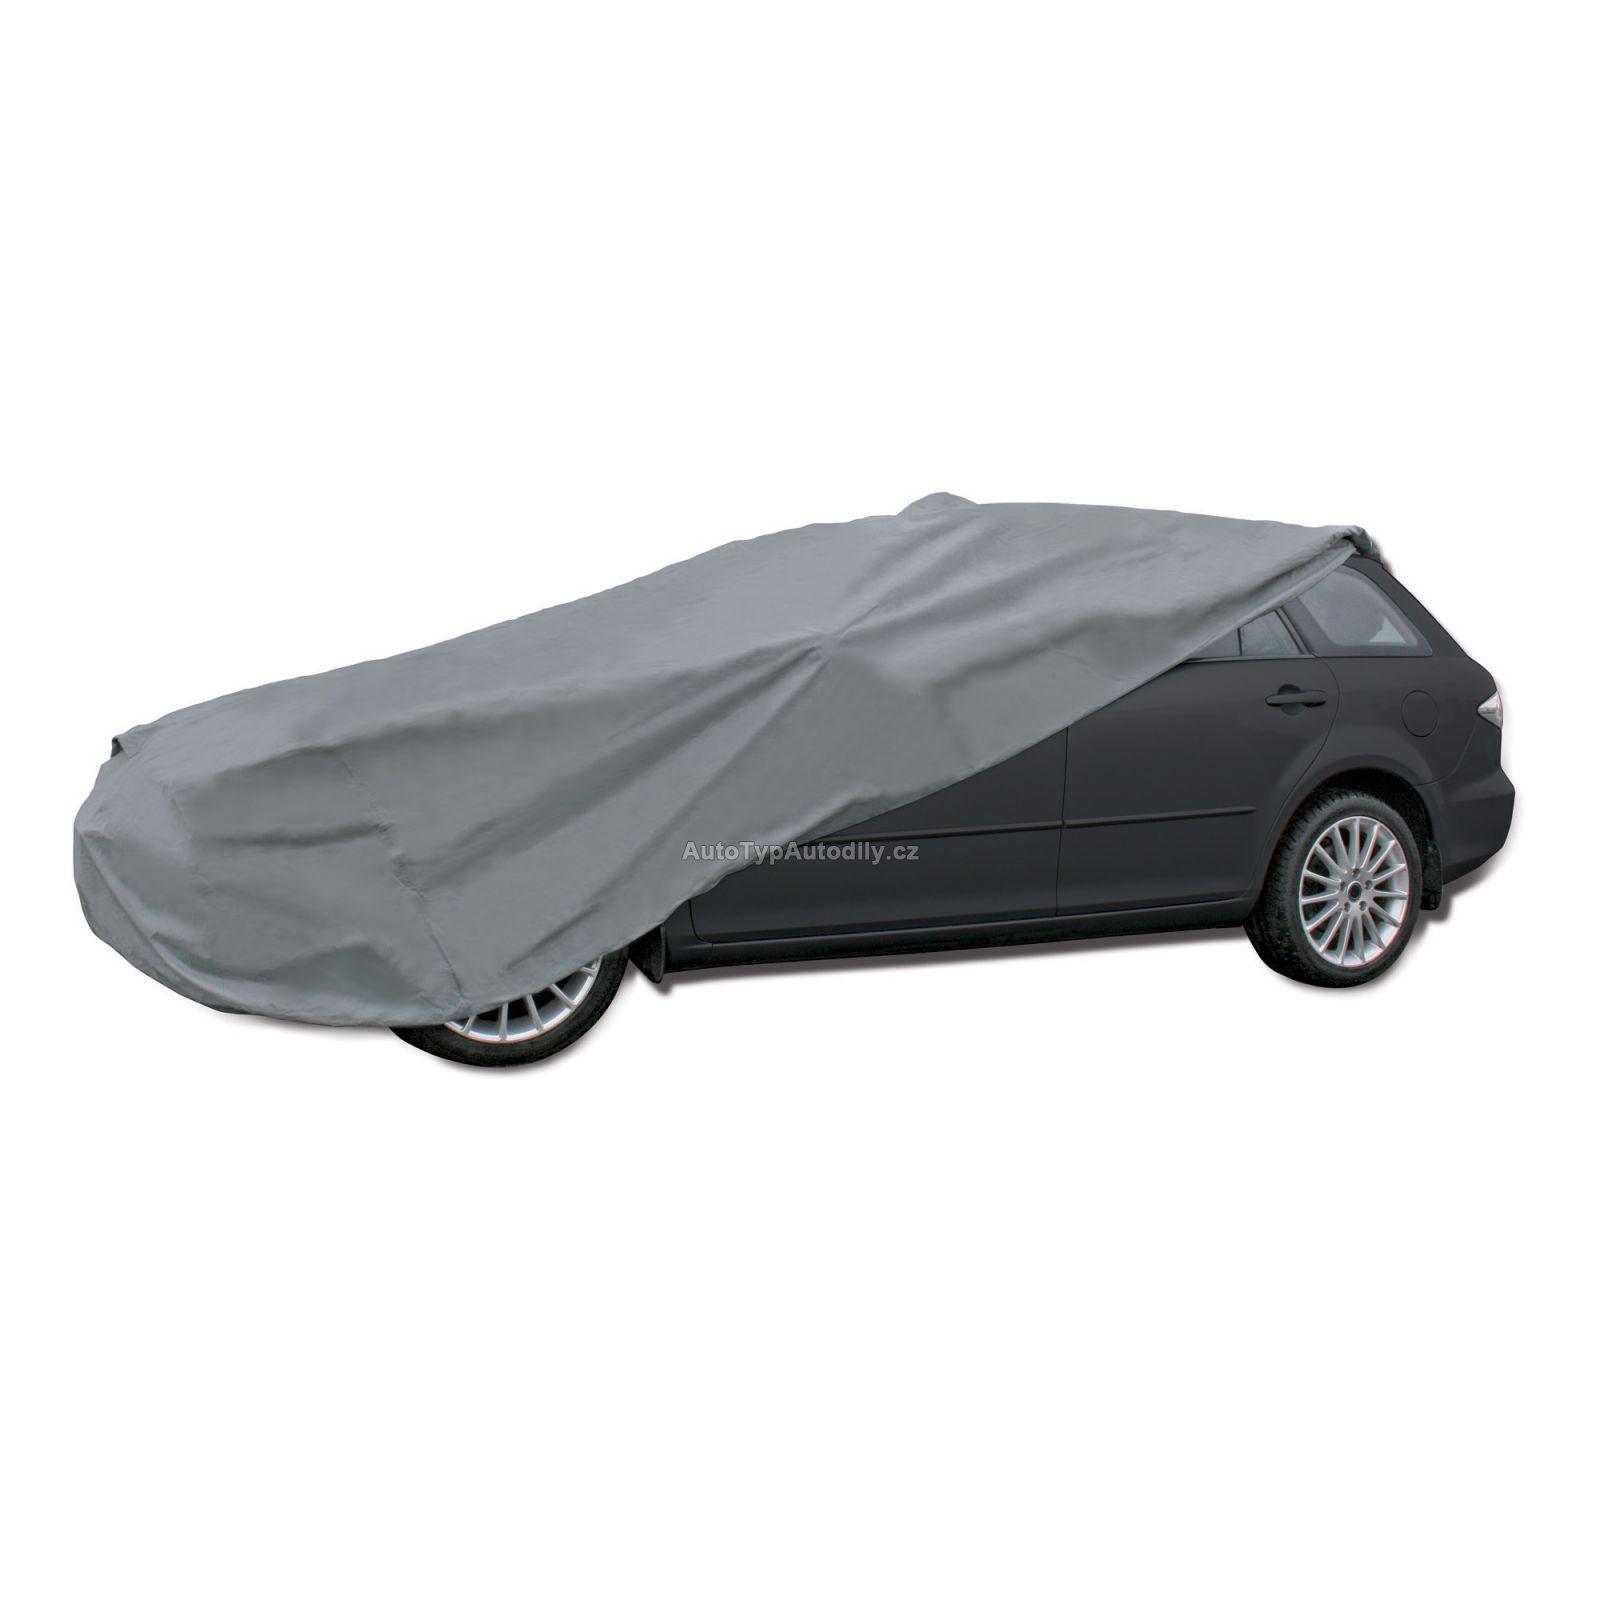 "www.autotypautodily.cz Plachta na auto NYLON velikost ""L"" CARTOPIC 143340 KÓD: 143340"